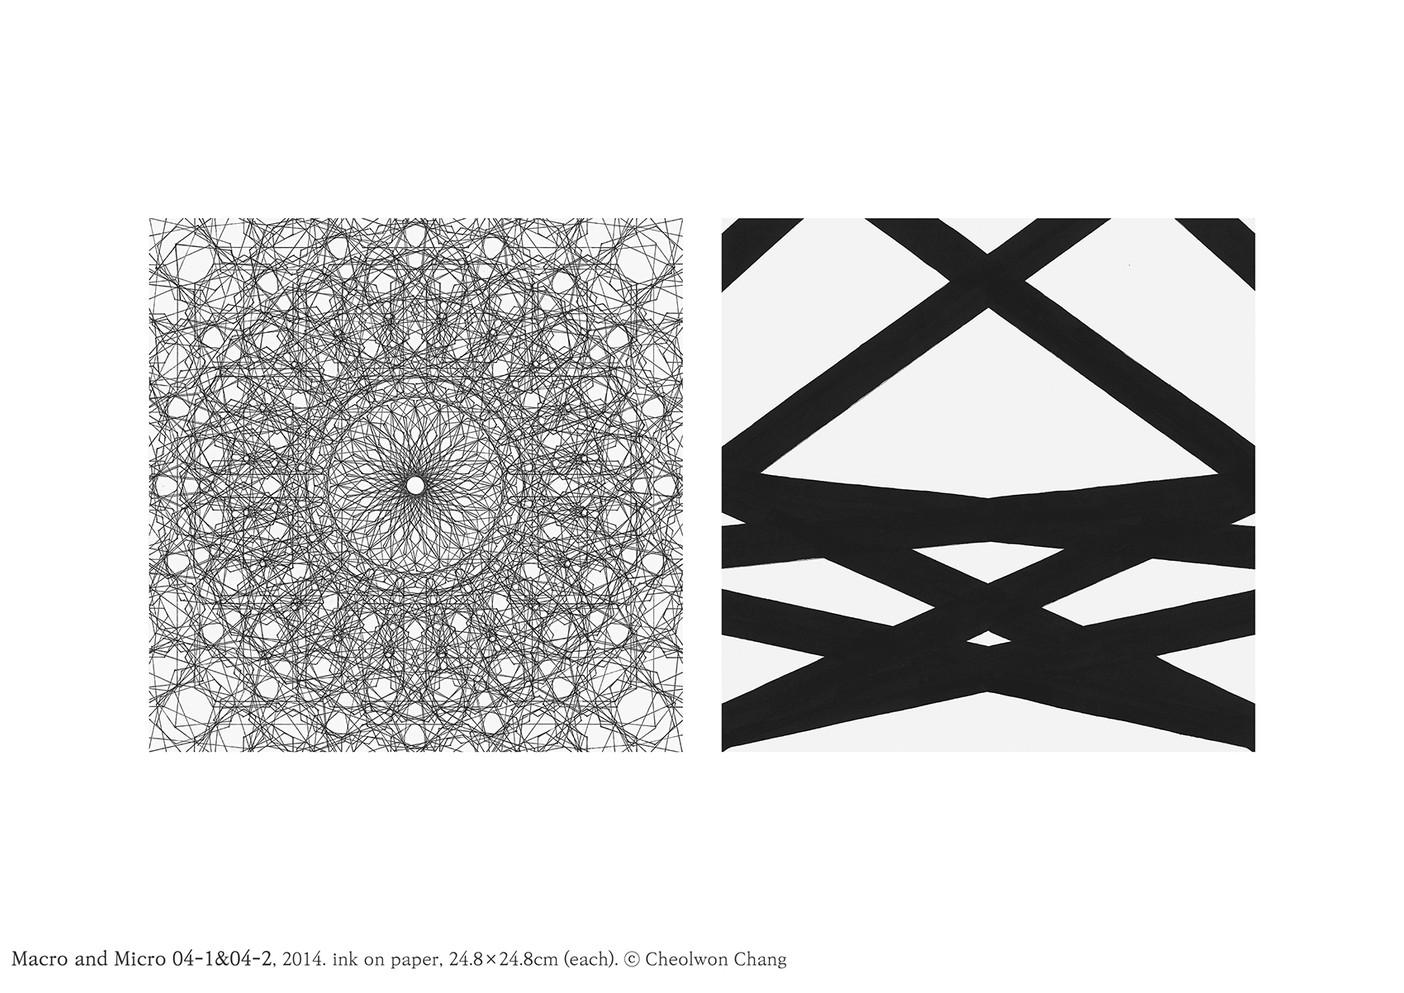 pattern_cheolwon chang (9).jpg